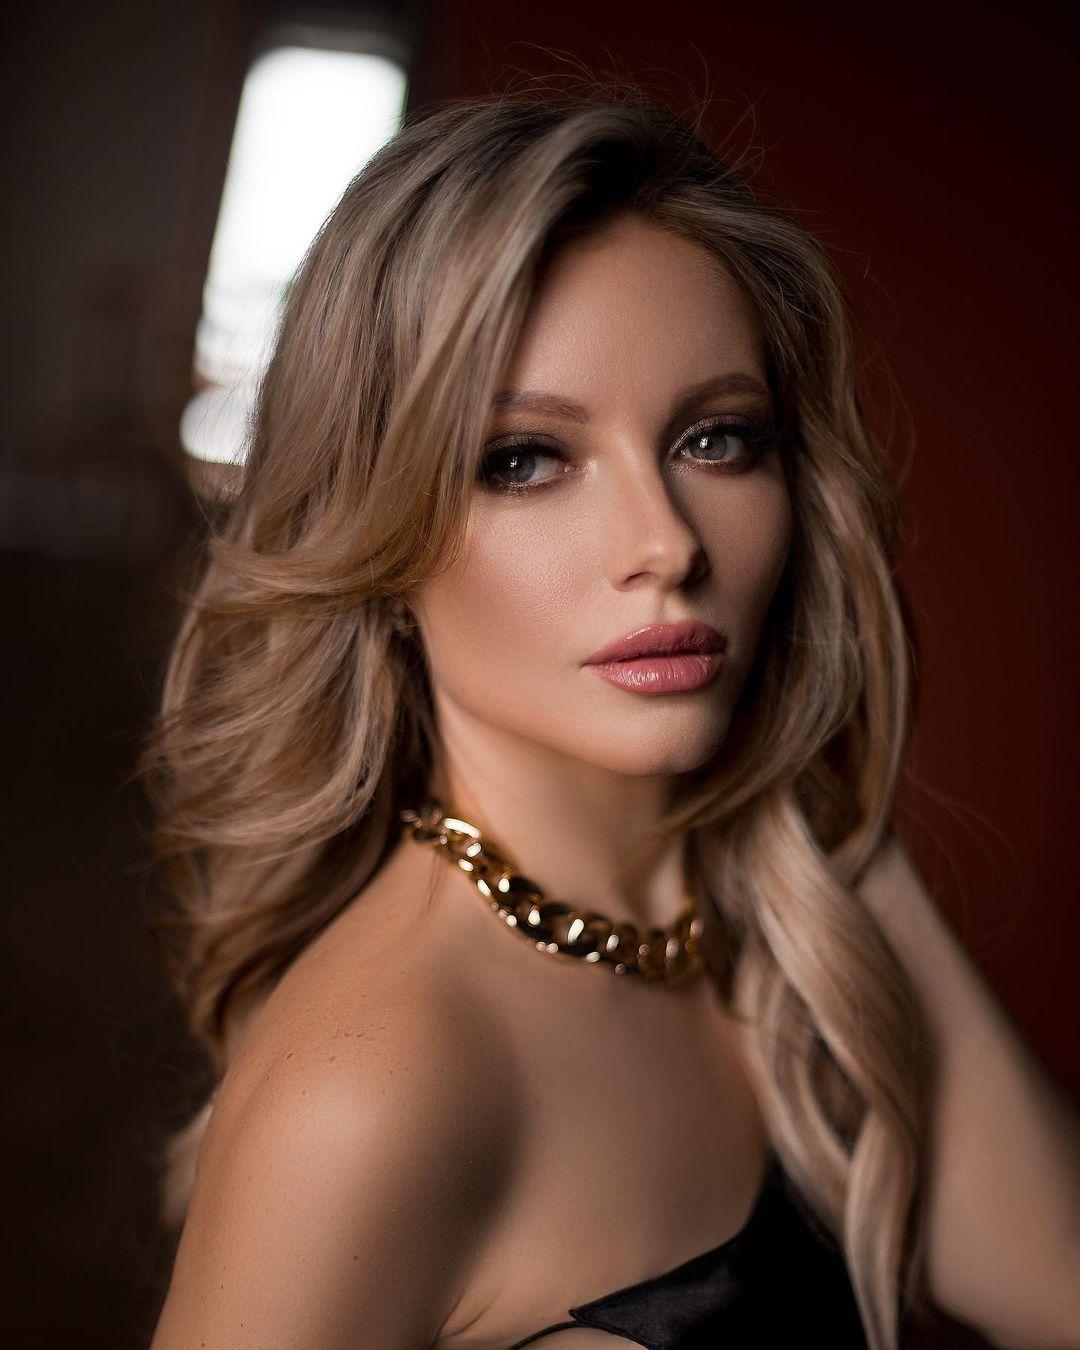 Ekaterina Zorina (katusha_zorina_)